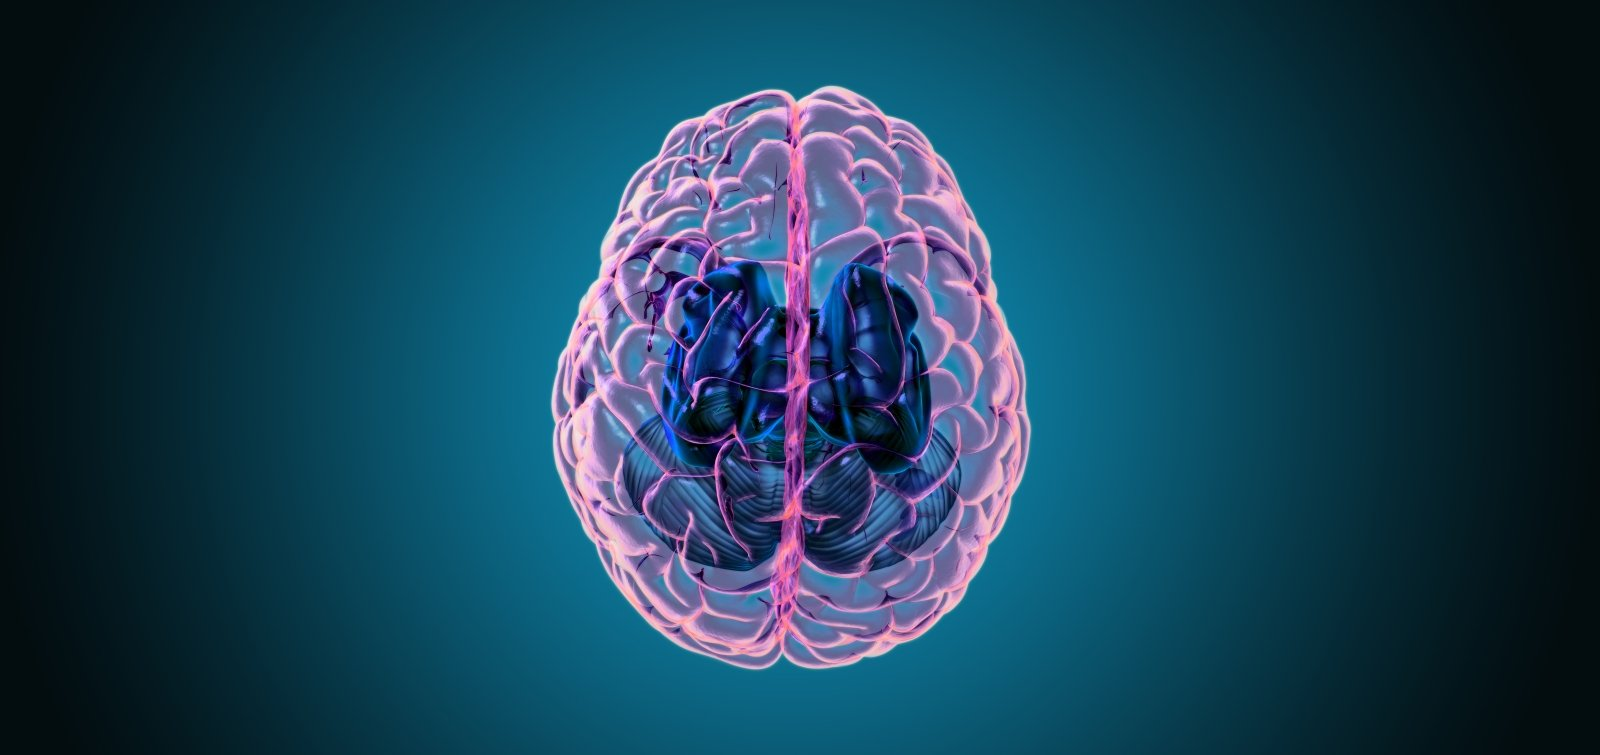 smegenys su hipertenzija